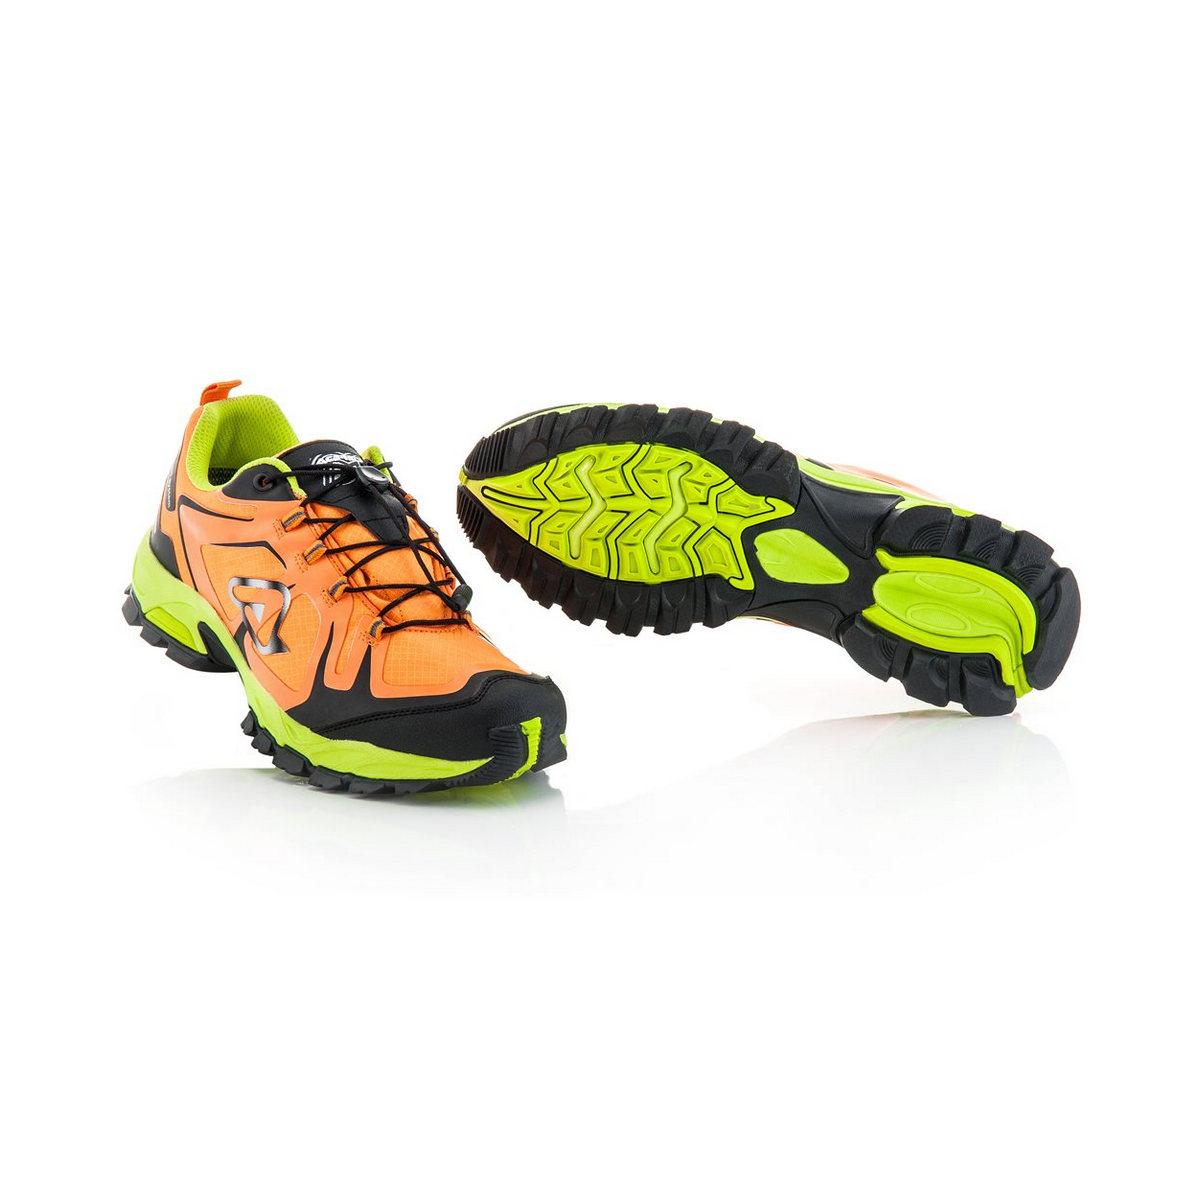 shoes trail wr orange/black size 45